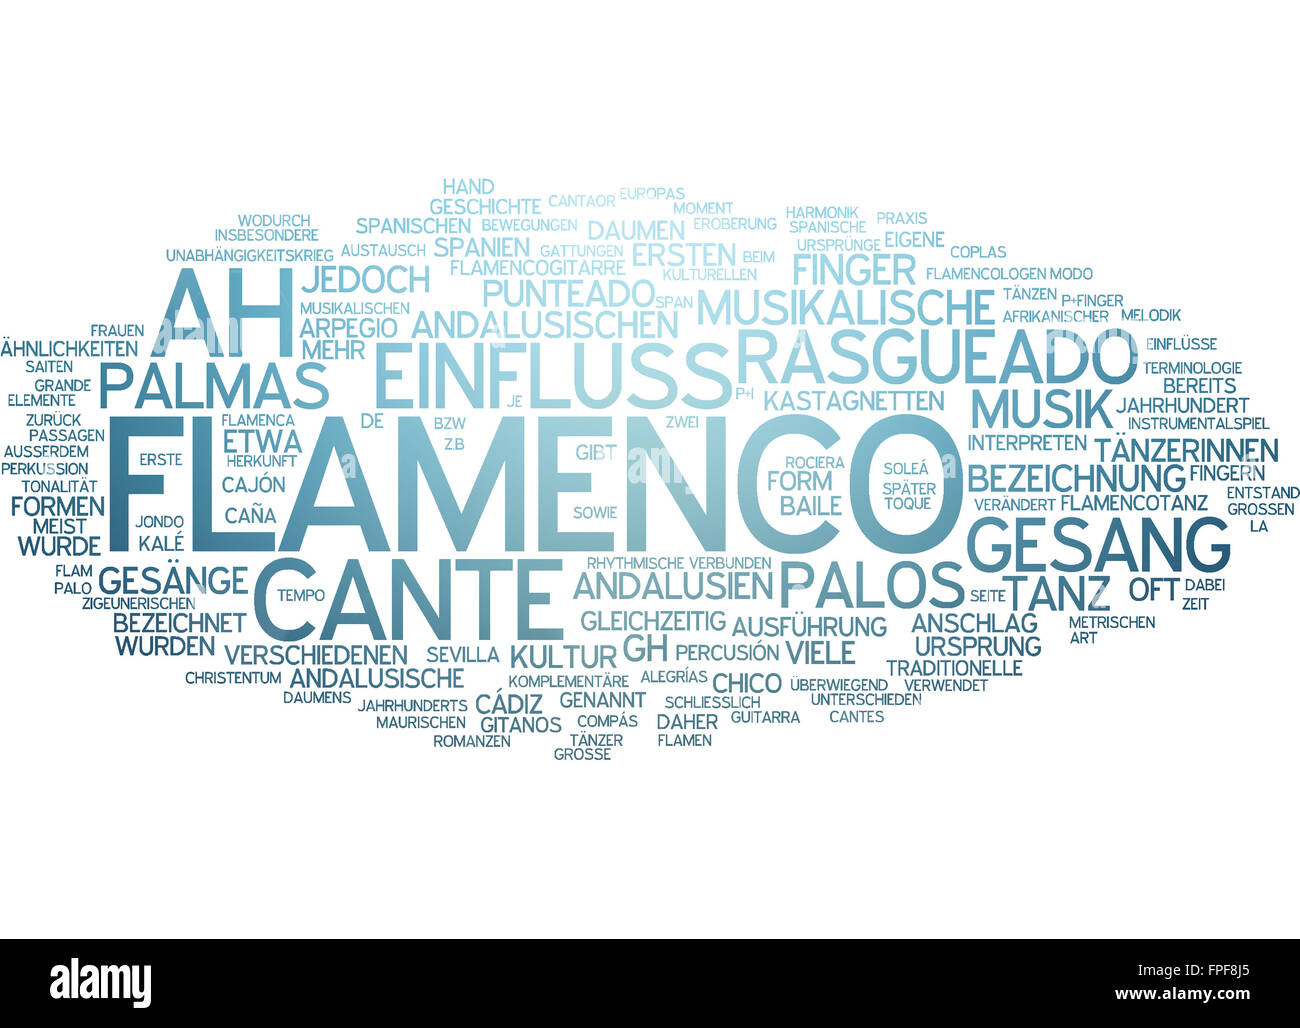 Flamenco Tanz Dance Tanzen Rasgueado Gesang Palos - Stock Image